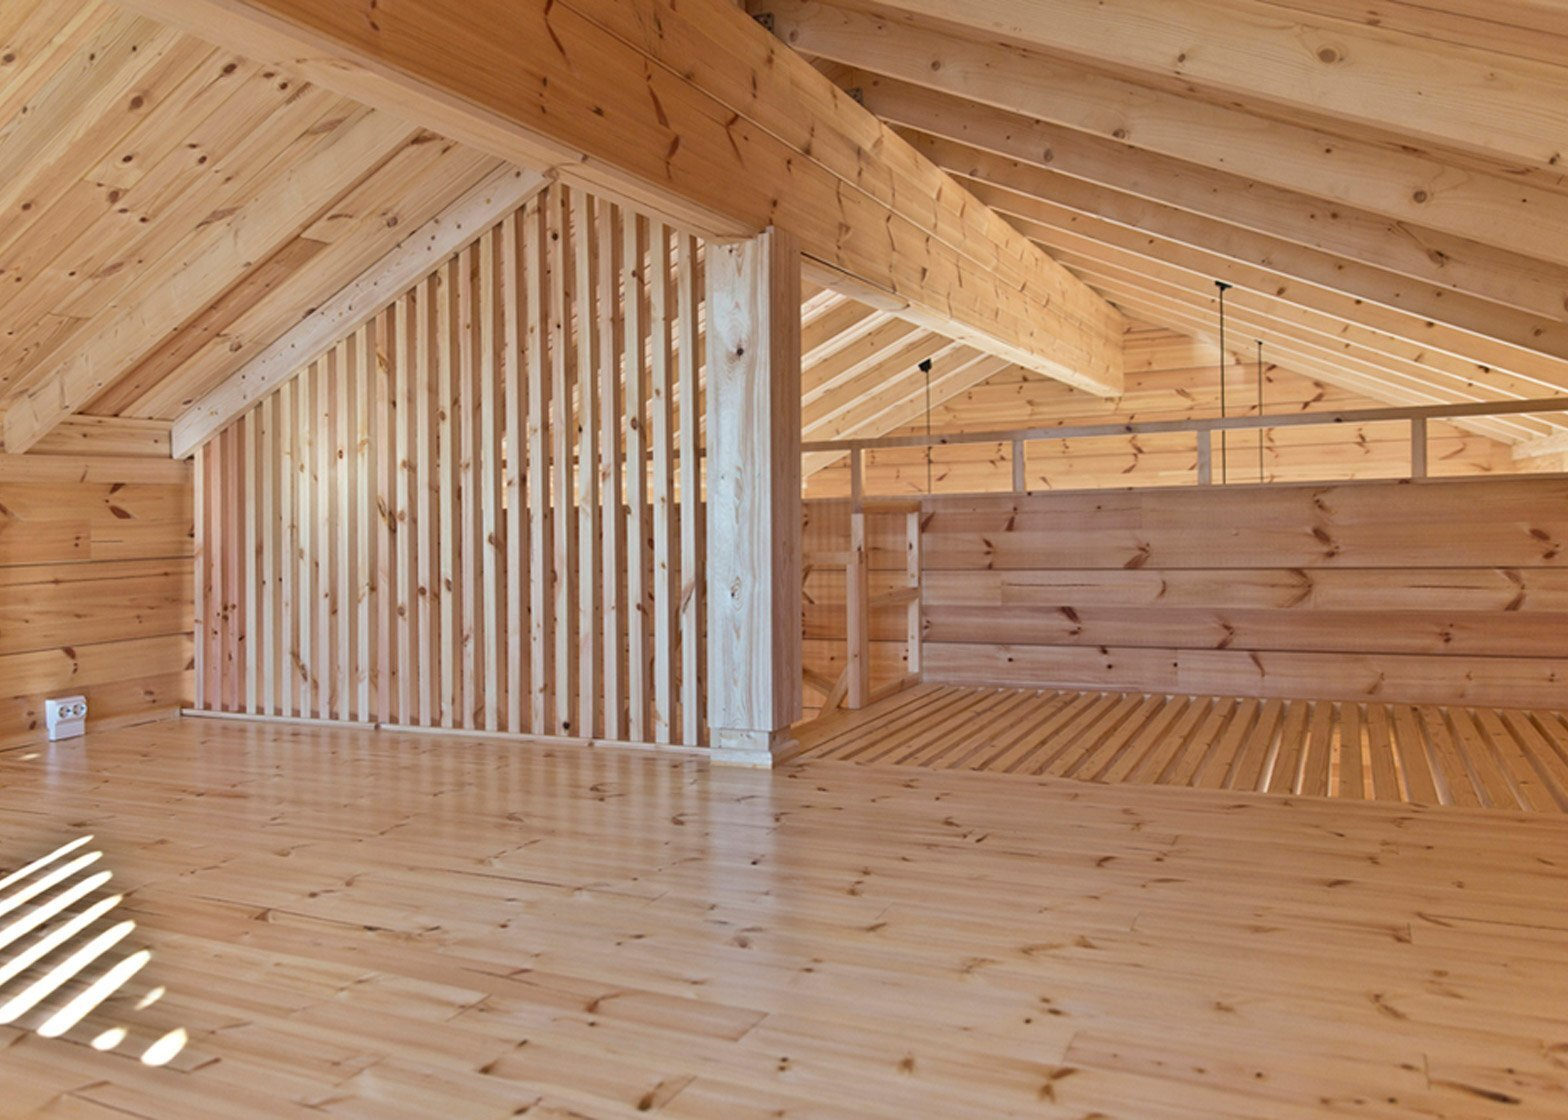 Cabin K - Sini Kamppari - Finland - Loft - Humble Homes